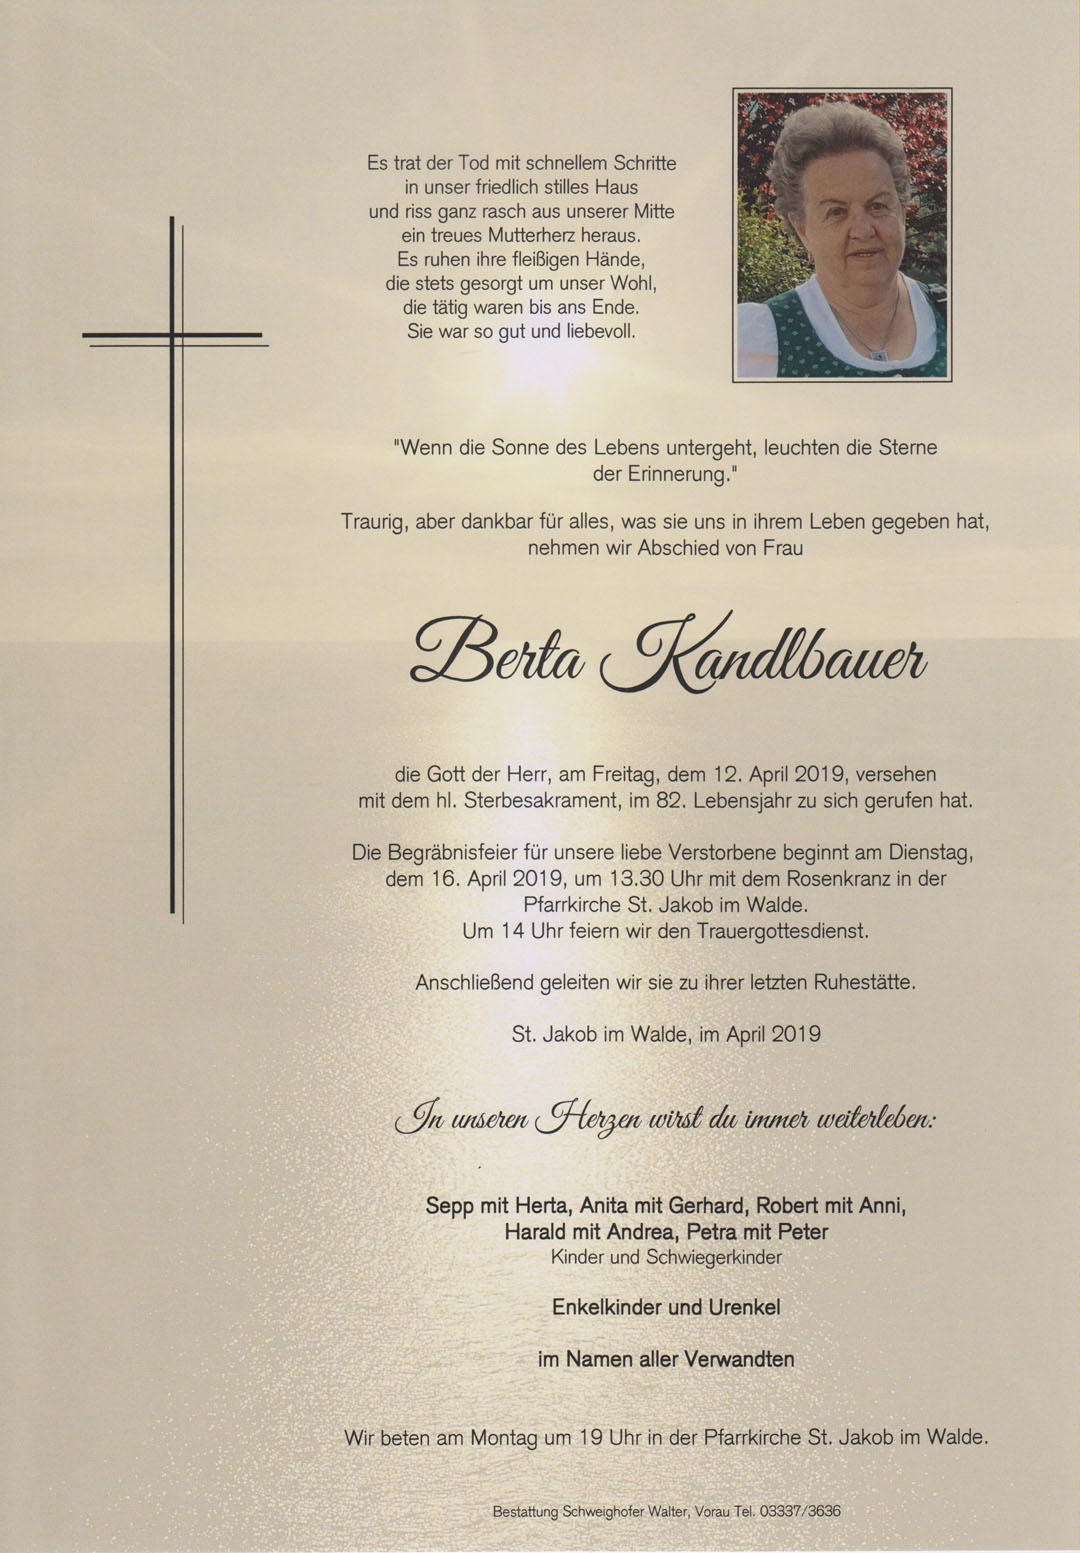 Berta Kandlbauer